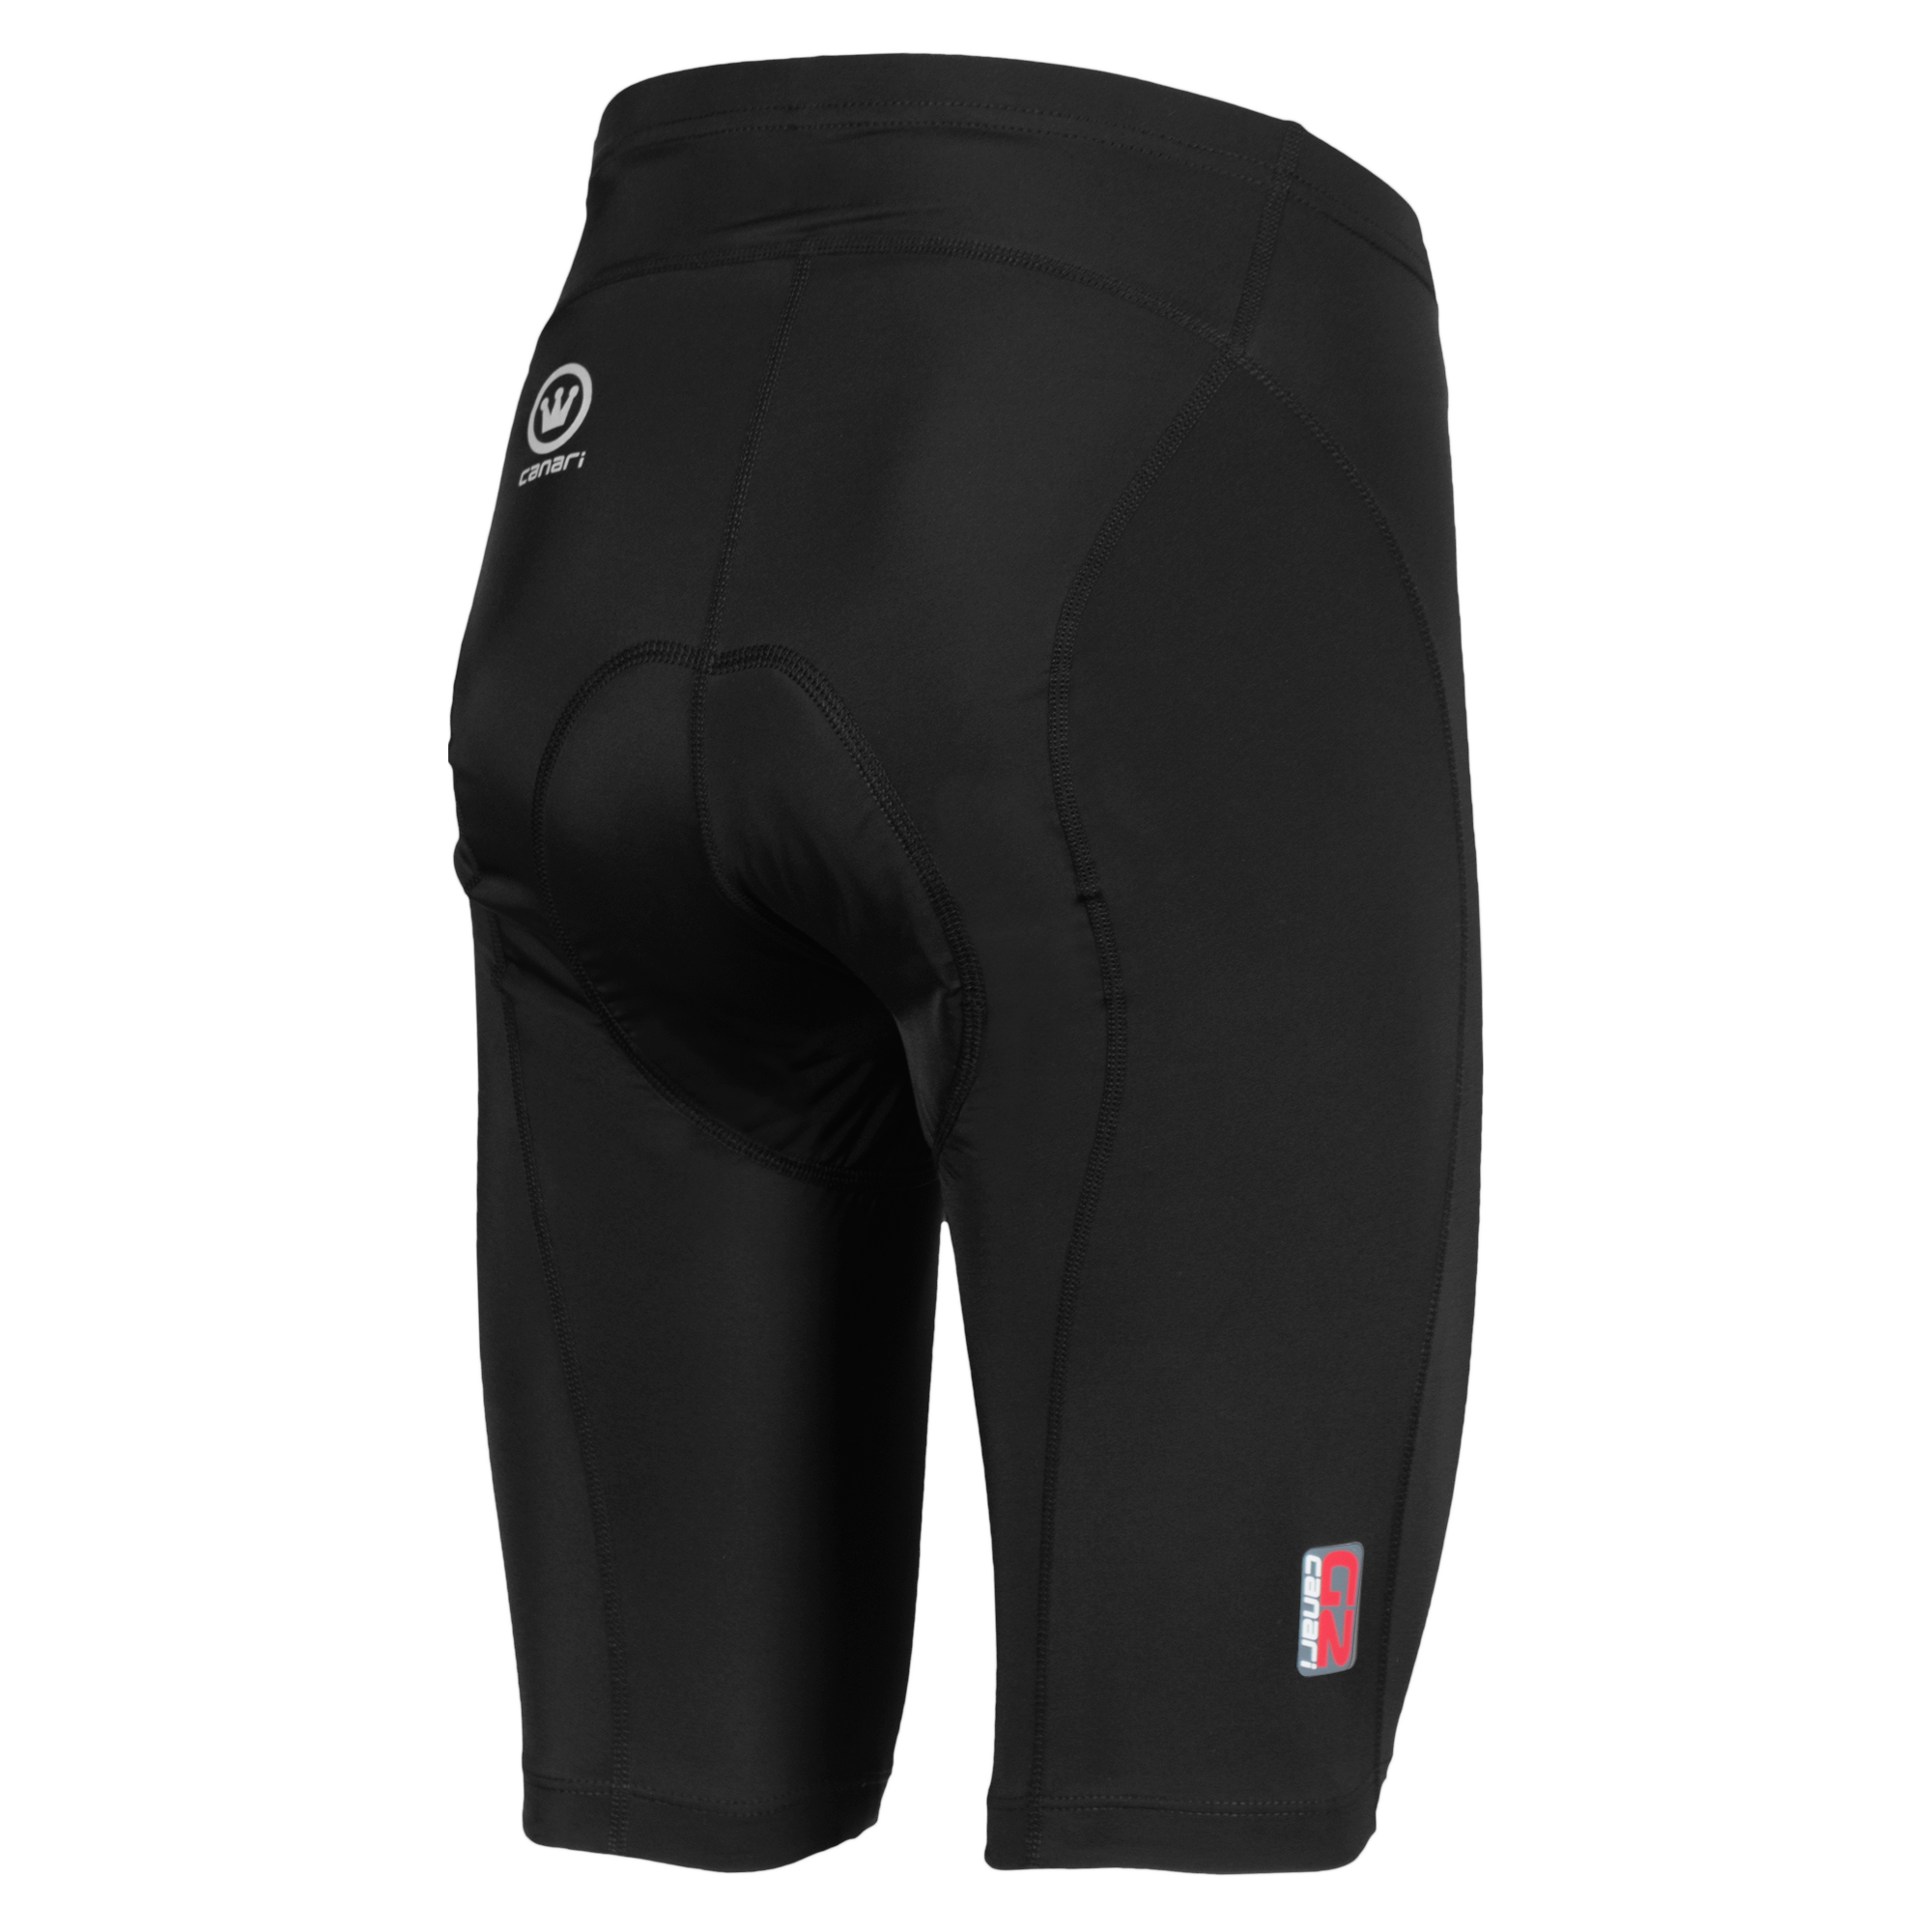 Short clipart sport shorts. Amazon com canari cyclewear